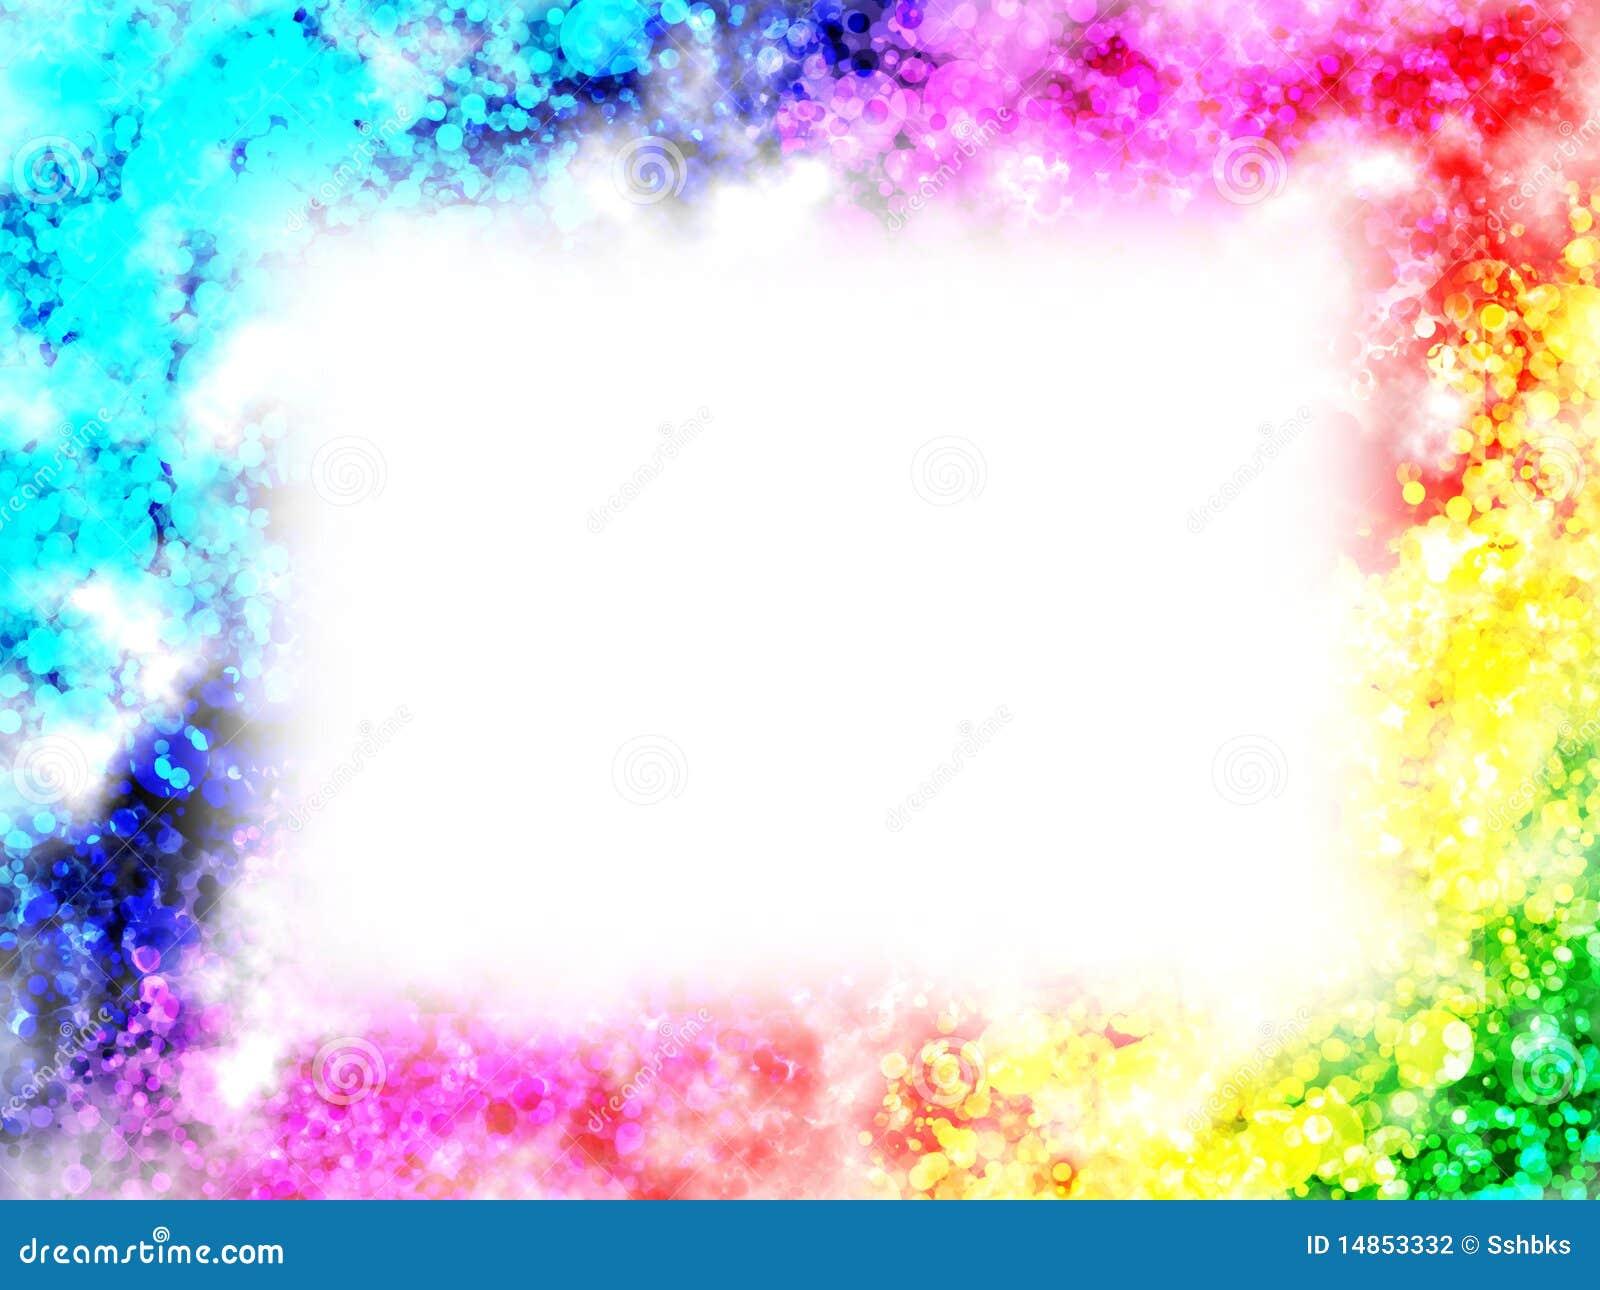 Rainbow frame stock illustration. Illustration of blur - 14853332